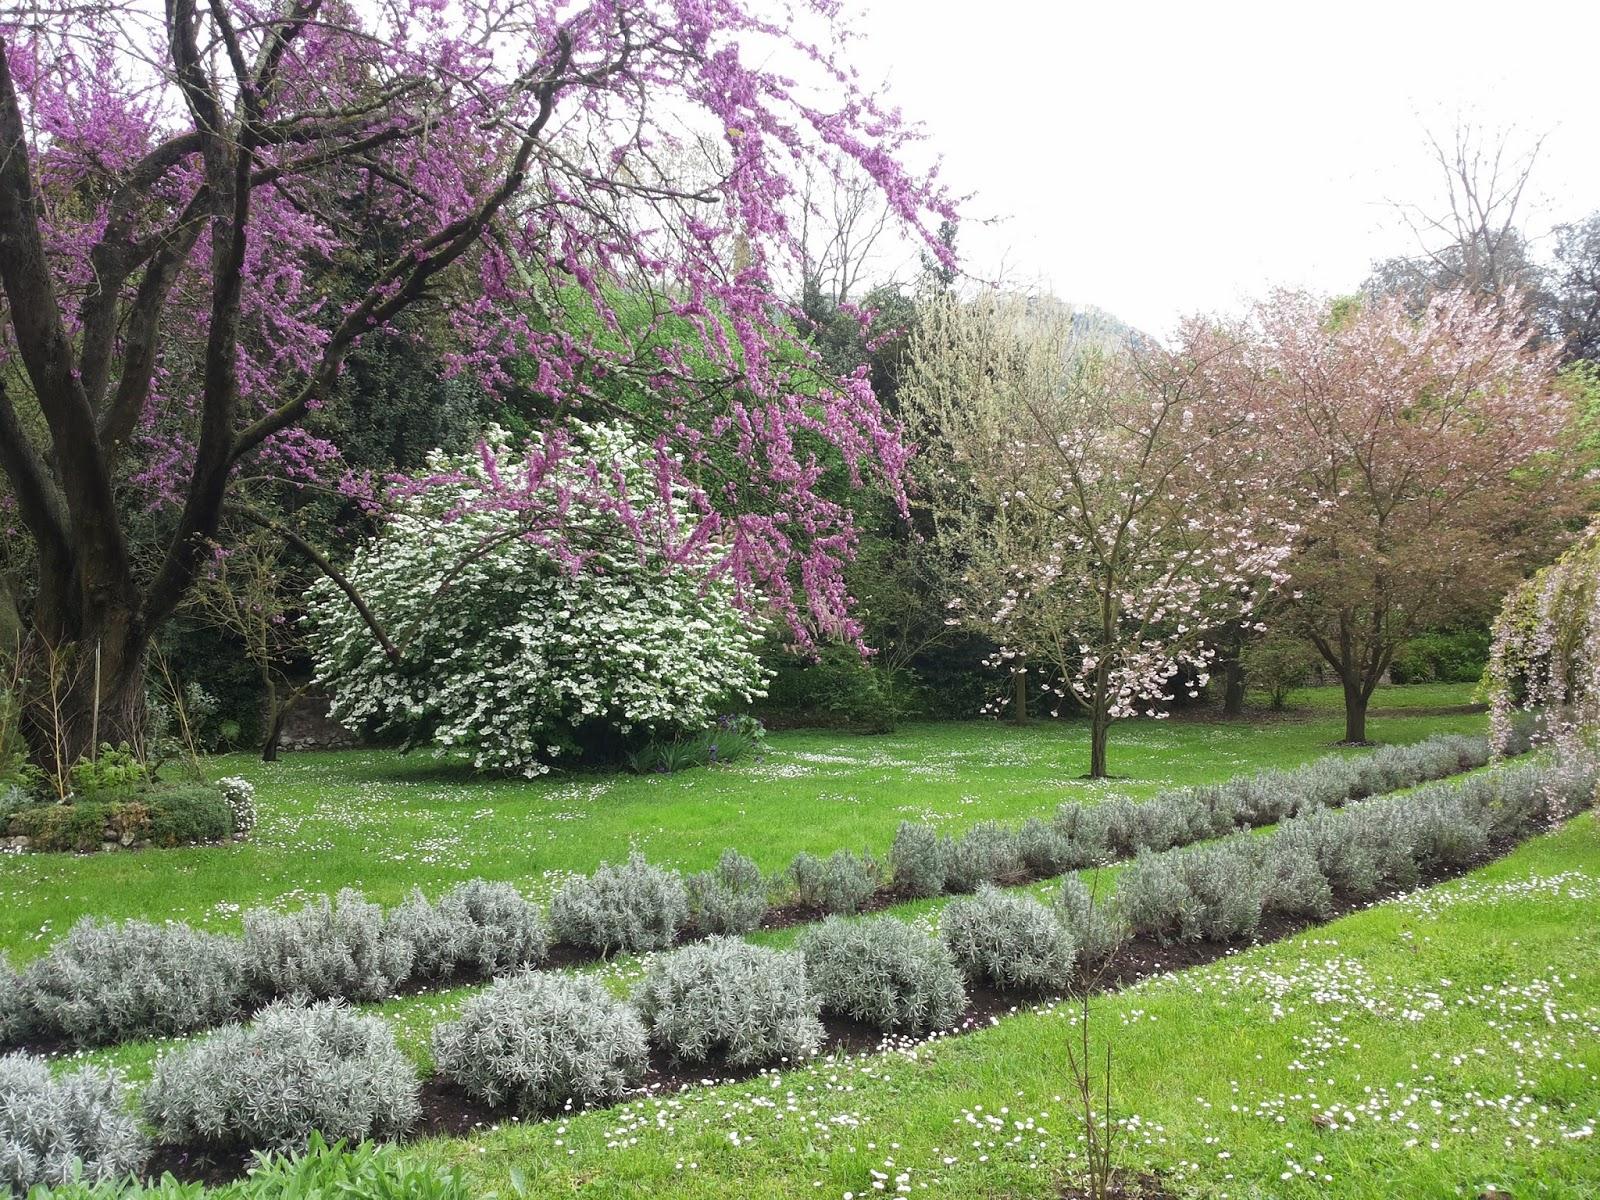 Viaggio serena i giardini di ninfa - I giardini di ninfa ...